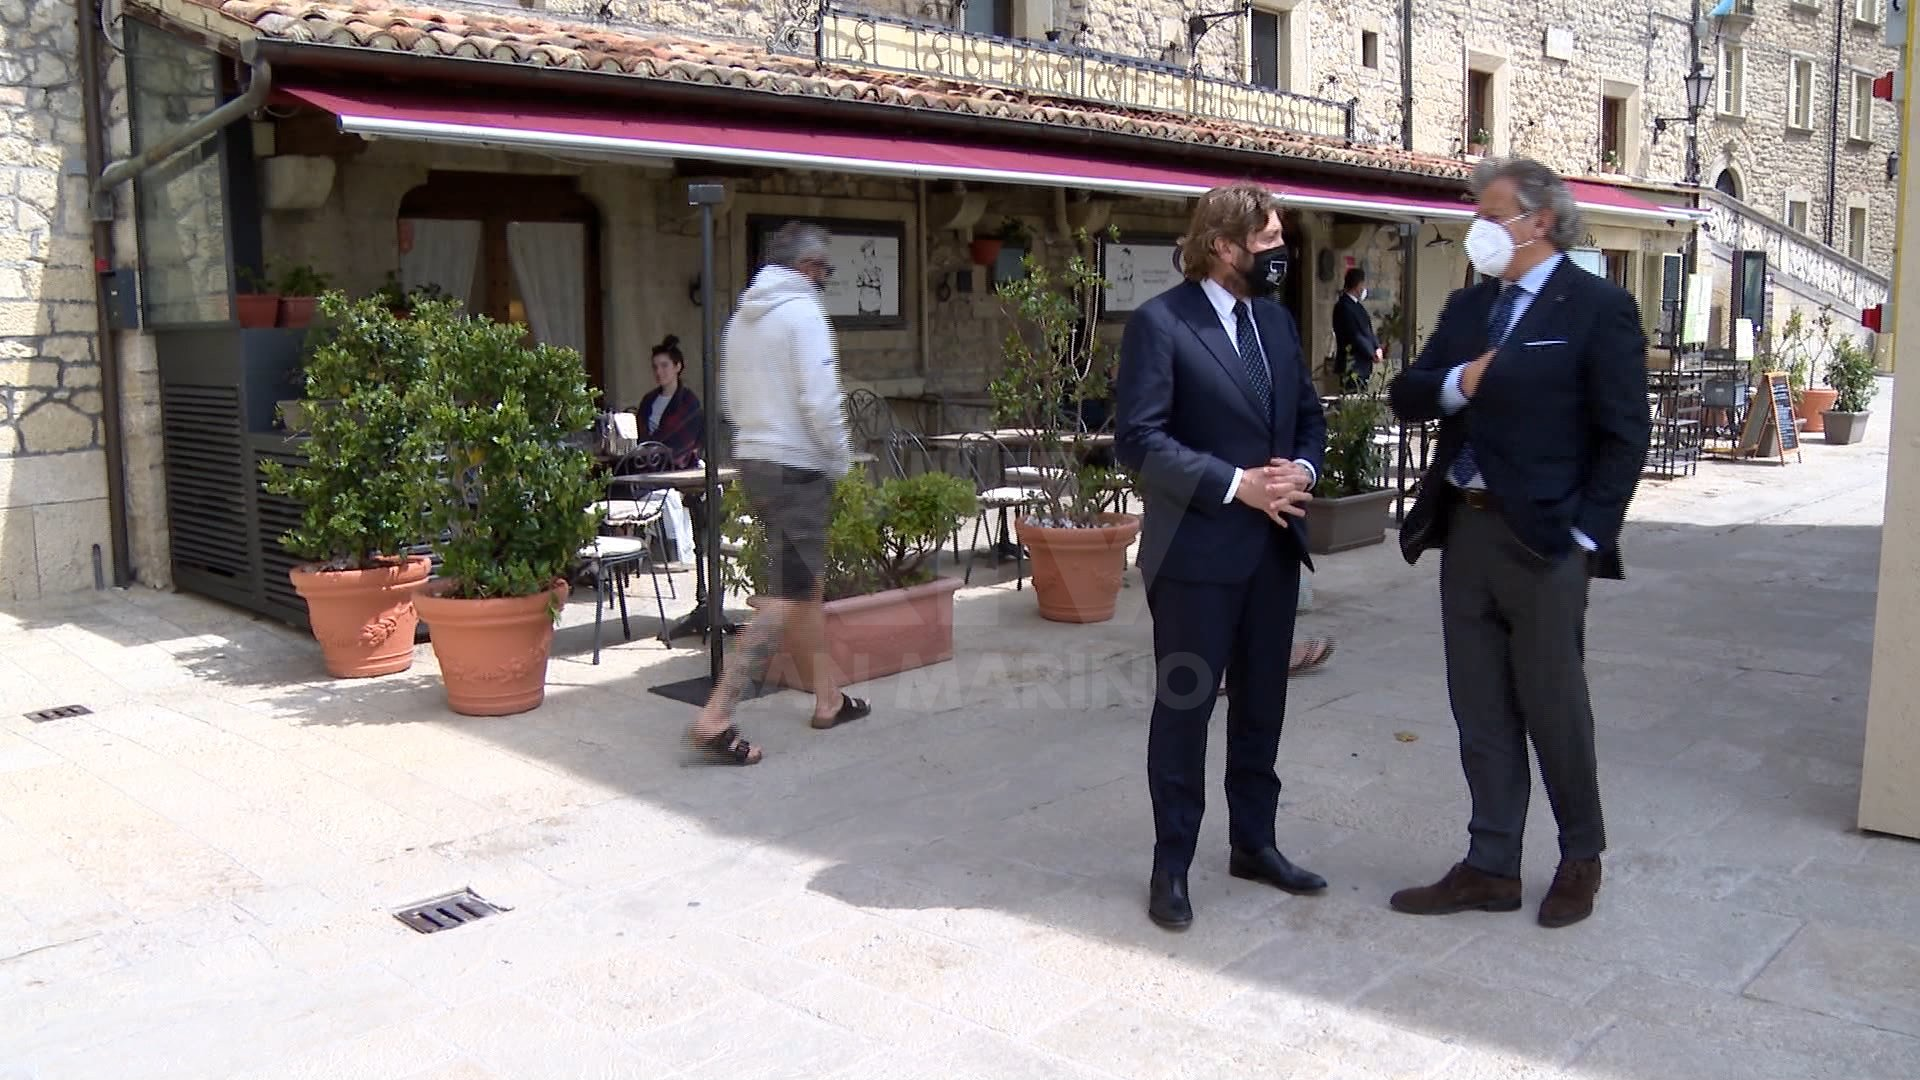 Federico Bidini Amate and Gianni Indino unite at a test event in San Marino